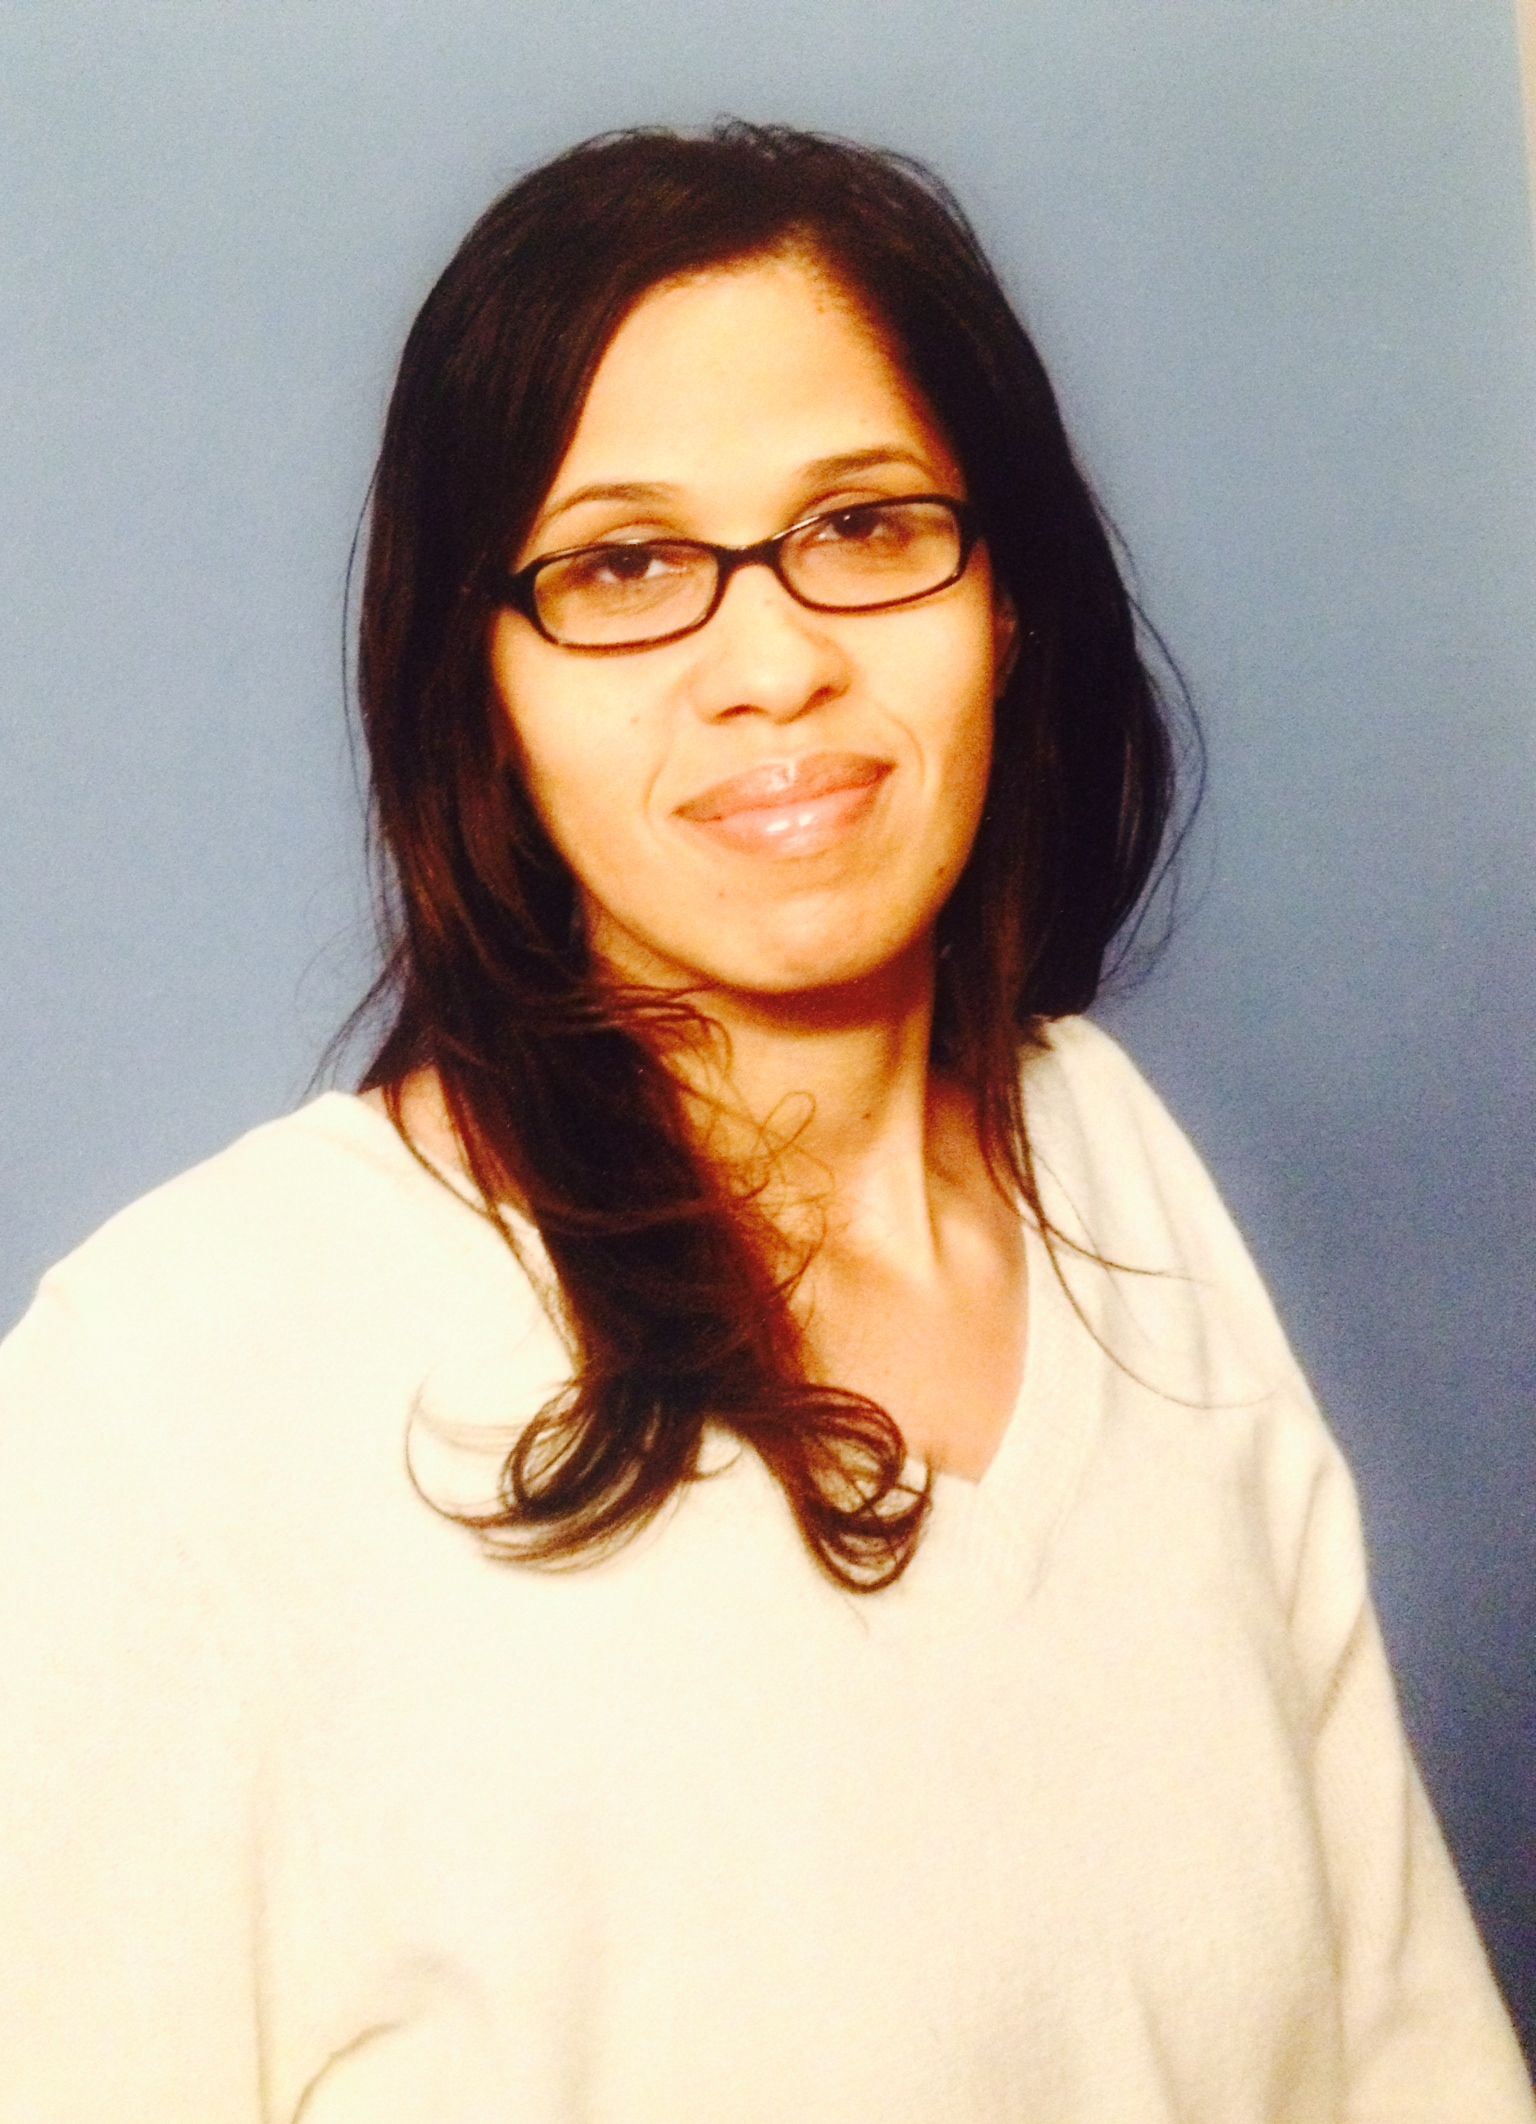 Lisa pinkard 12 executive director ceo youth